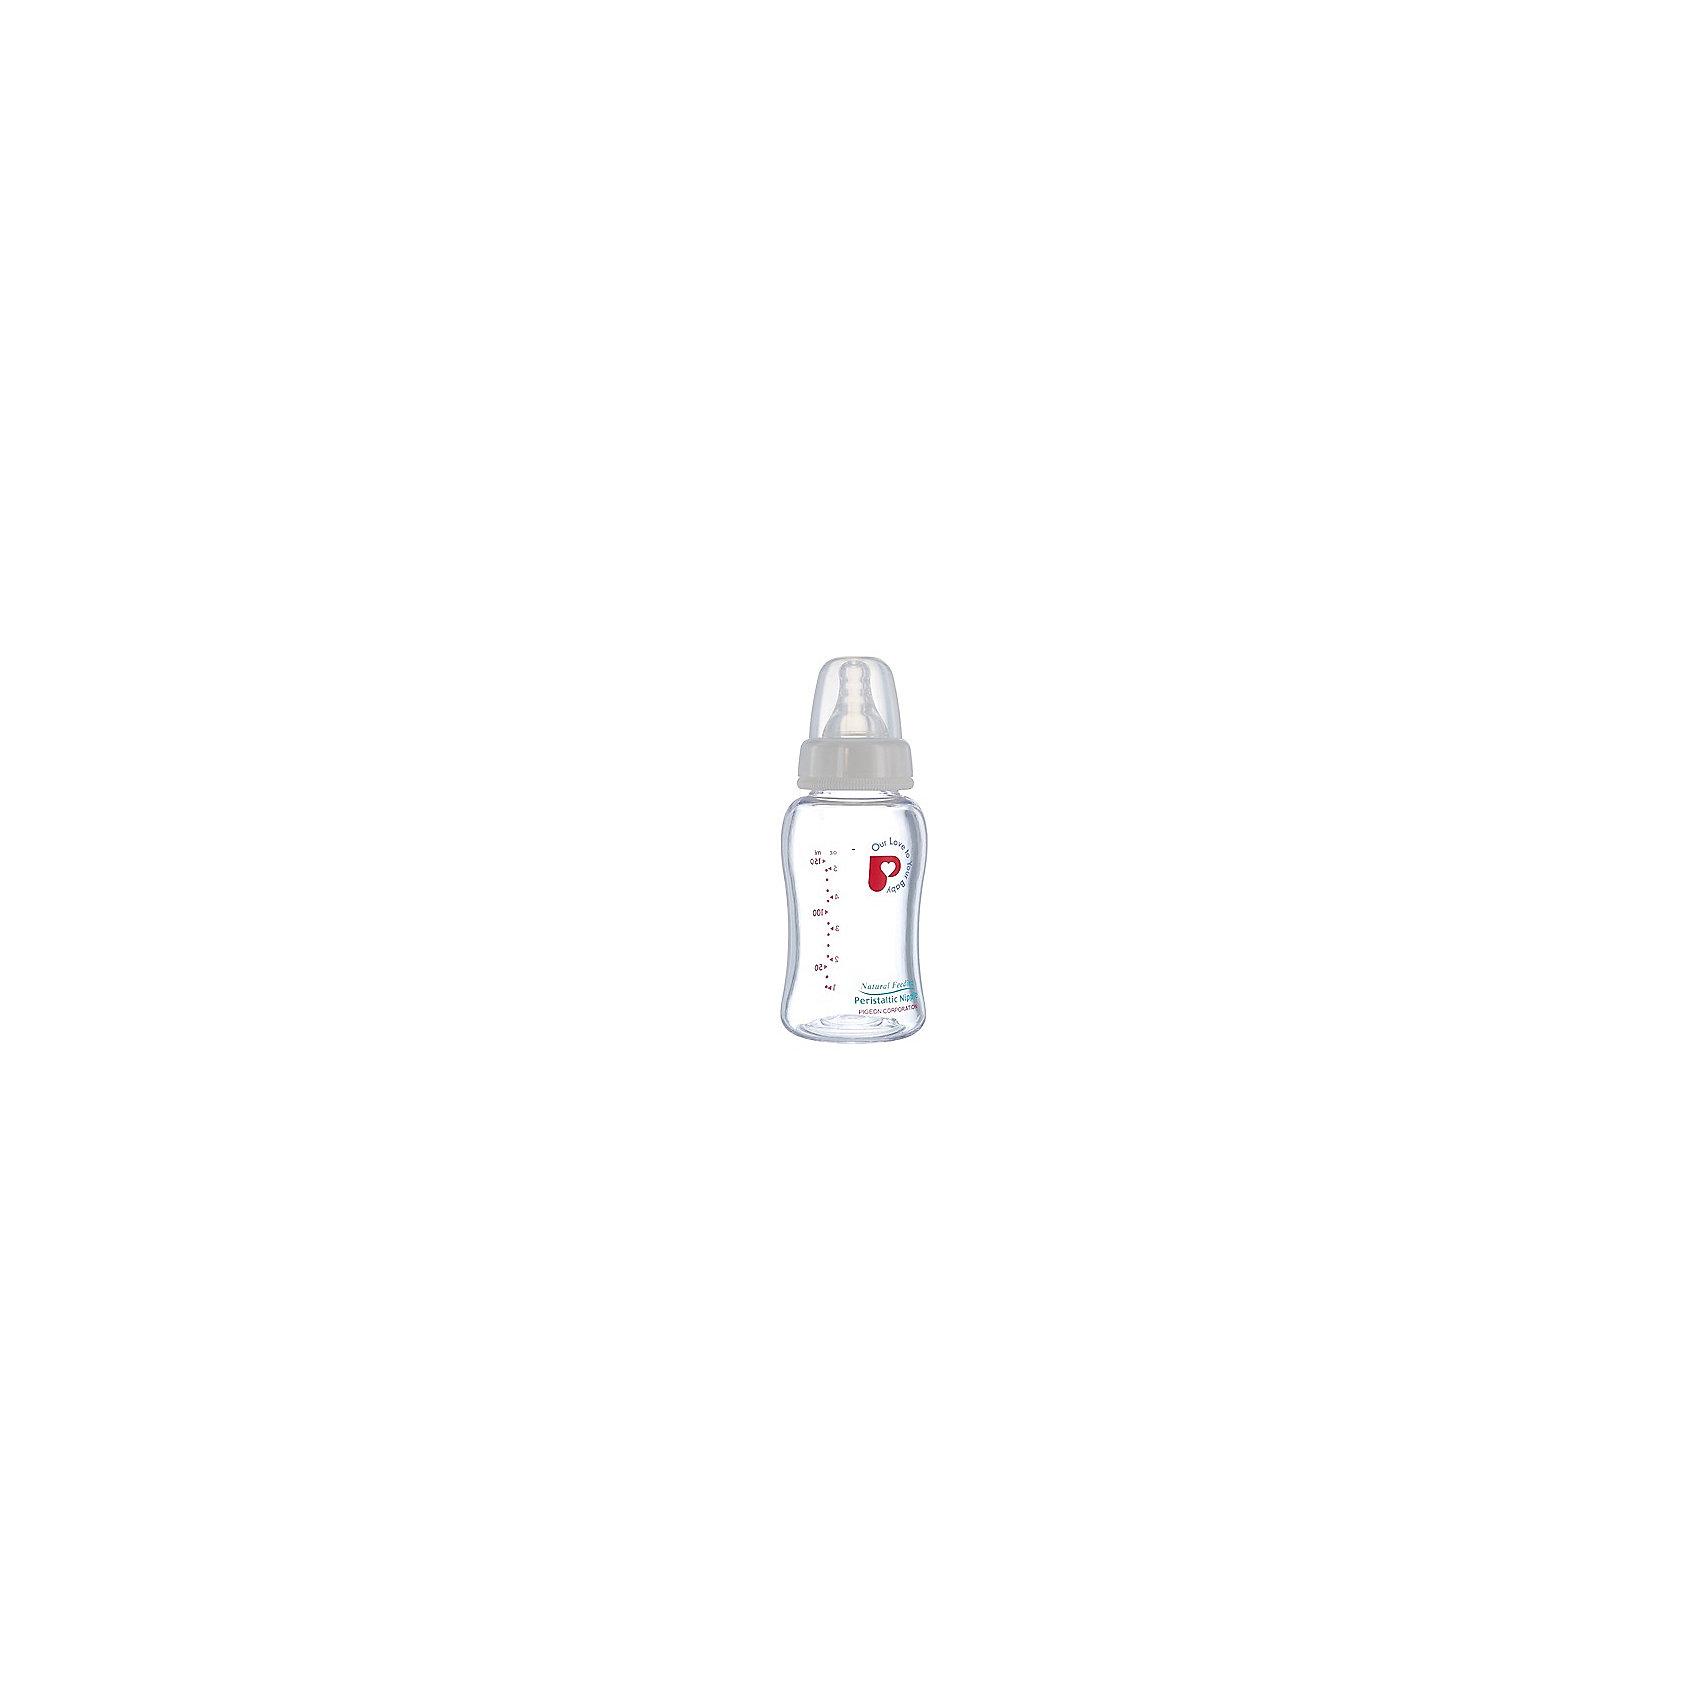 Бутылочка Перистальтик Плюс с широким горлышком 160мл, стекло, Pigeon